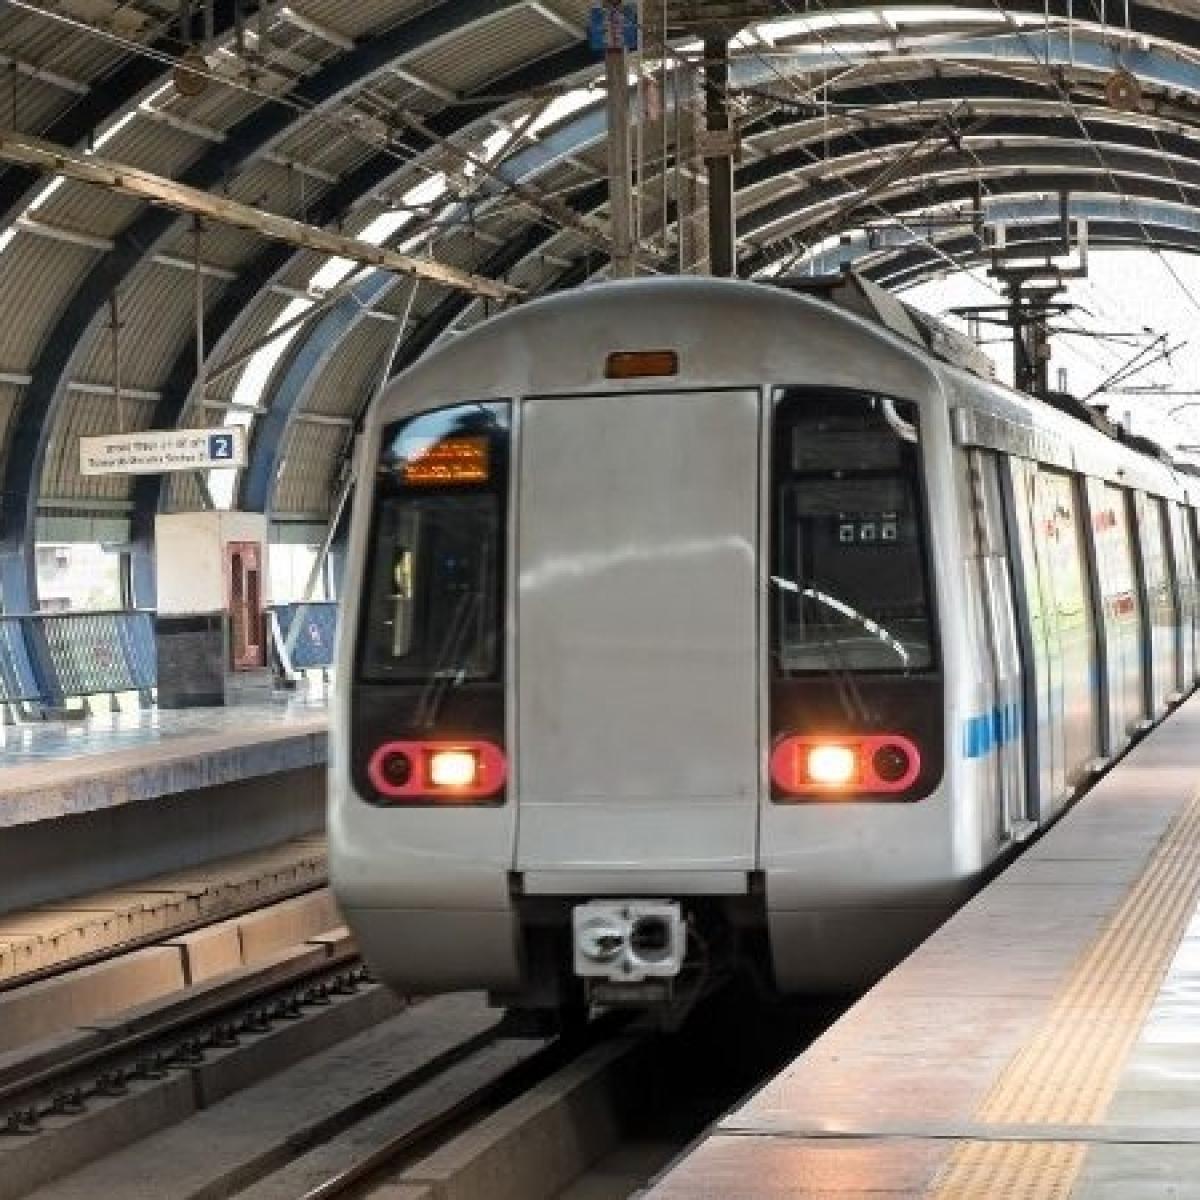 MMRDA to developmulti-modalintegration for Metro 2 & 7